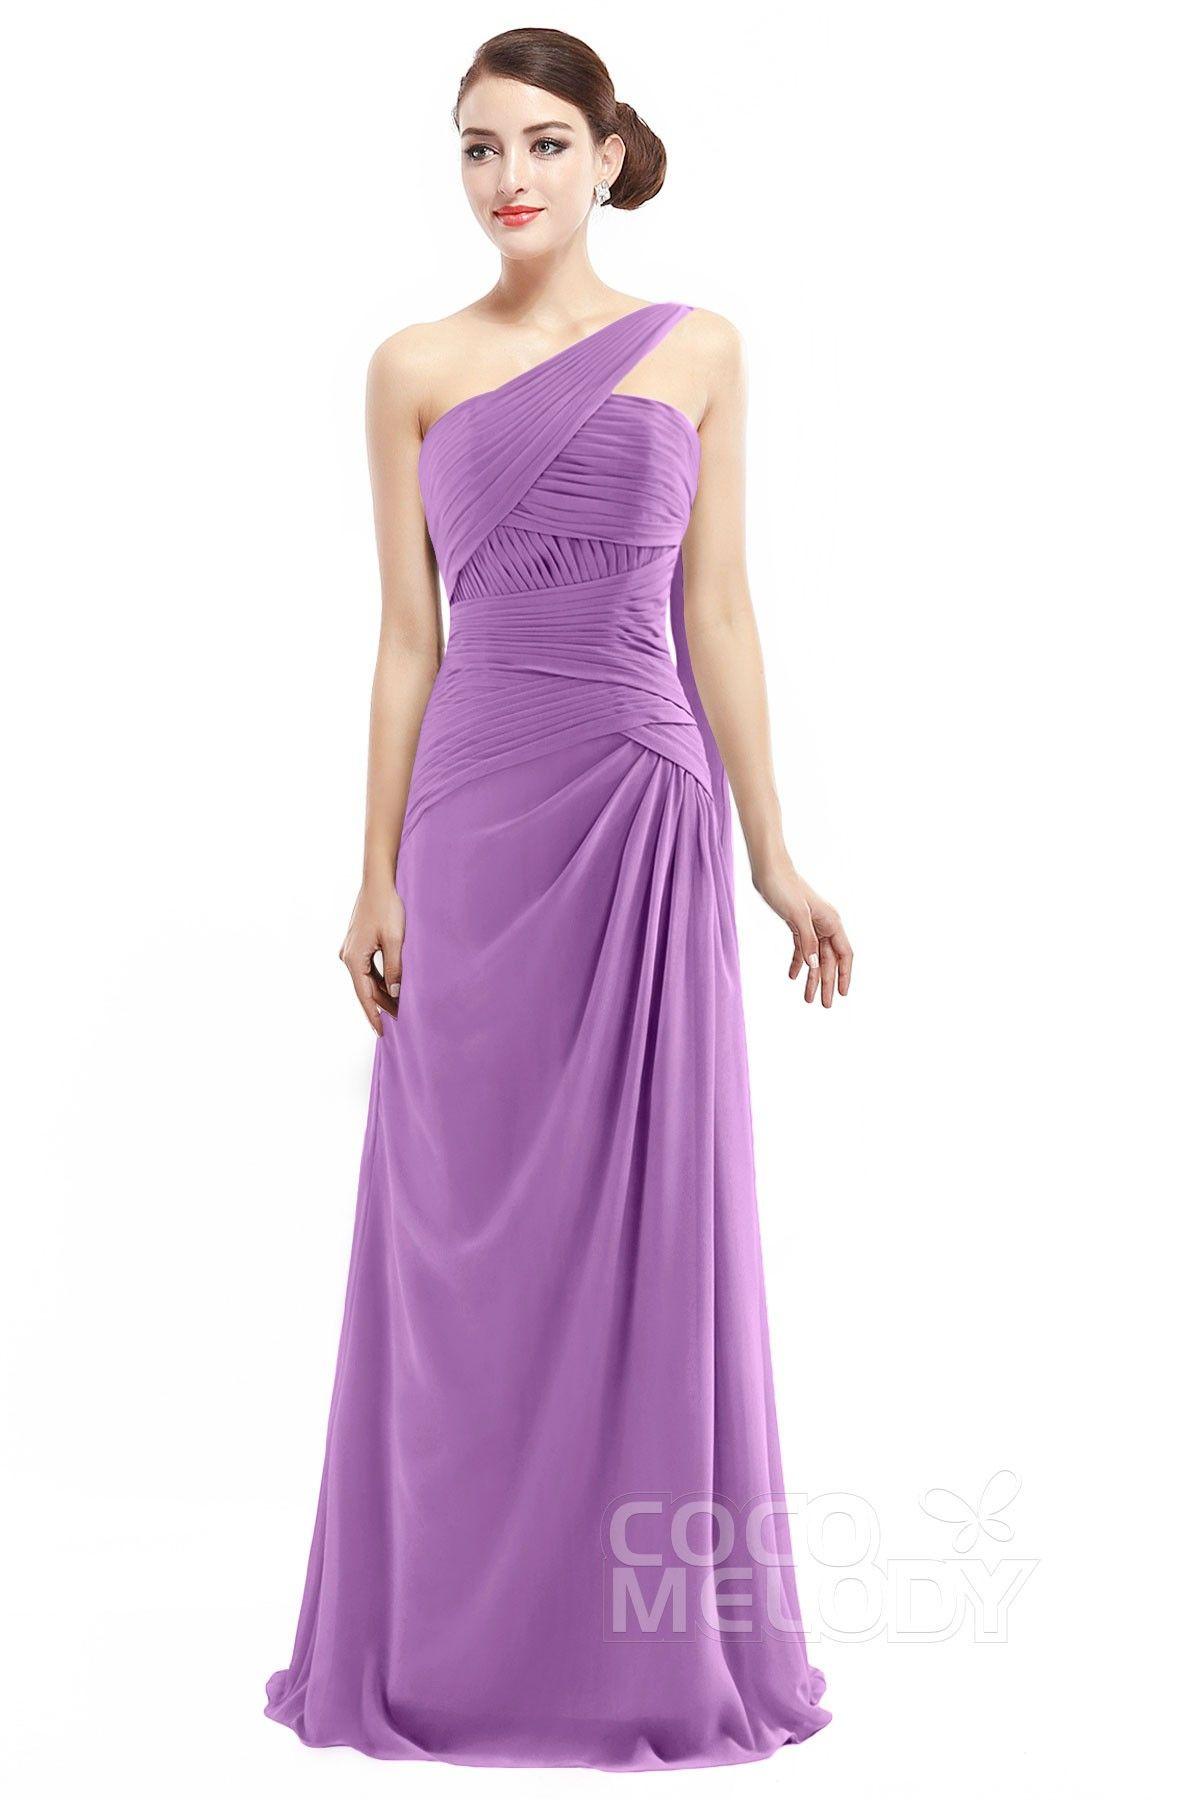 one shoulder column chiffon bridesmaid dresses